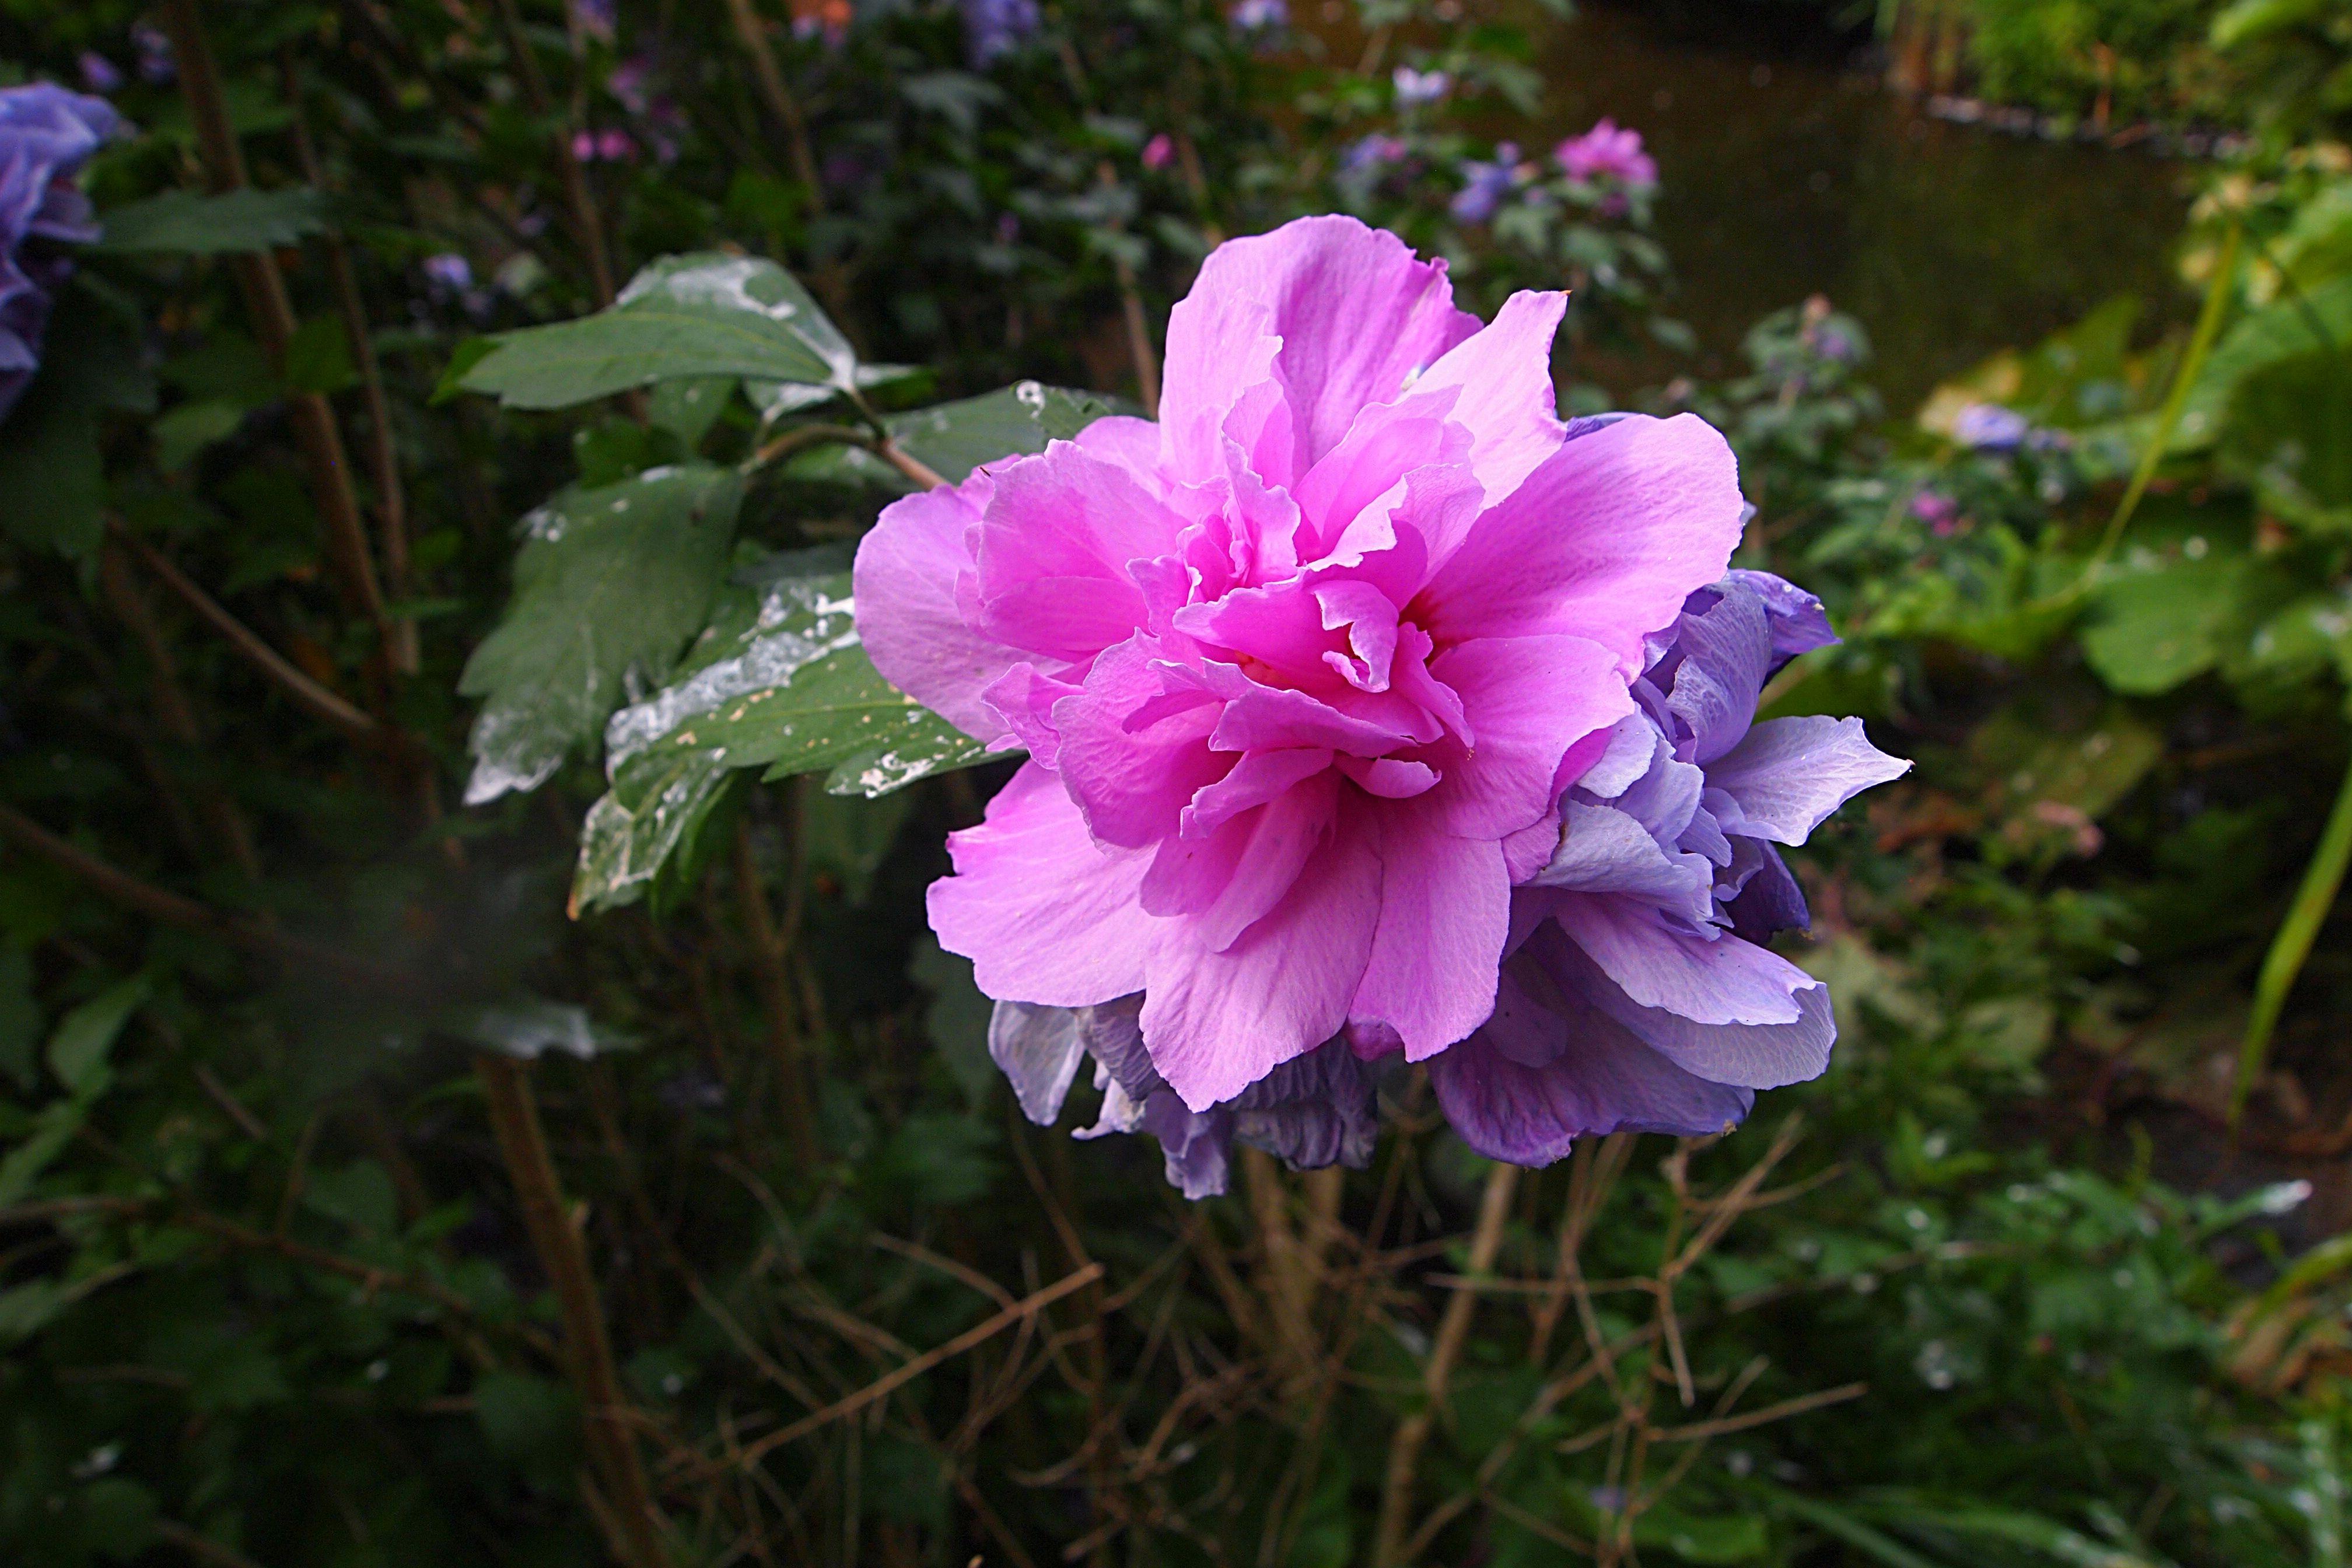 Immagini belle : natura petalo estate colore botanica flora